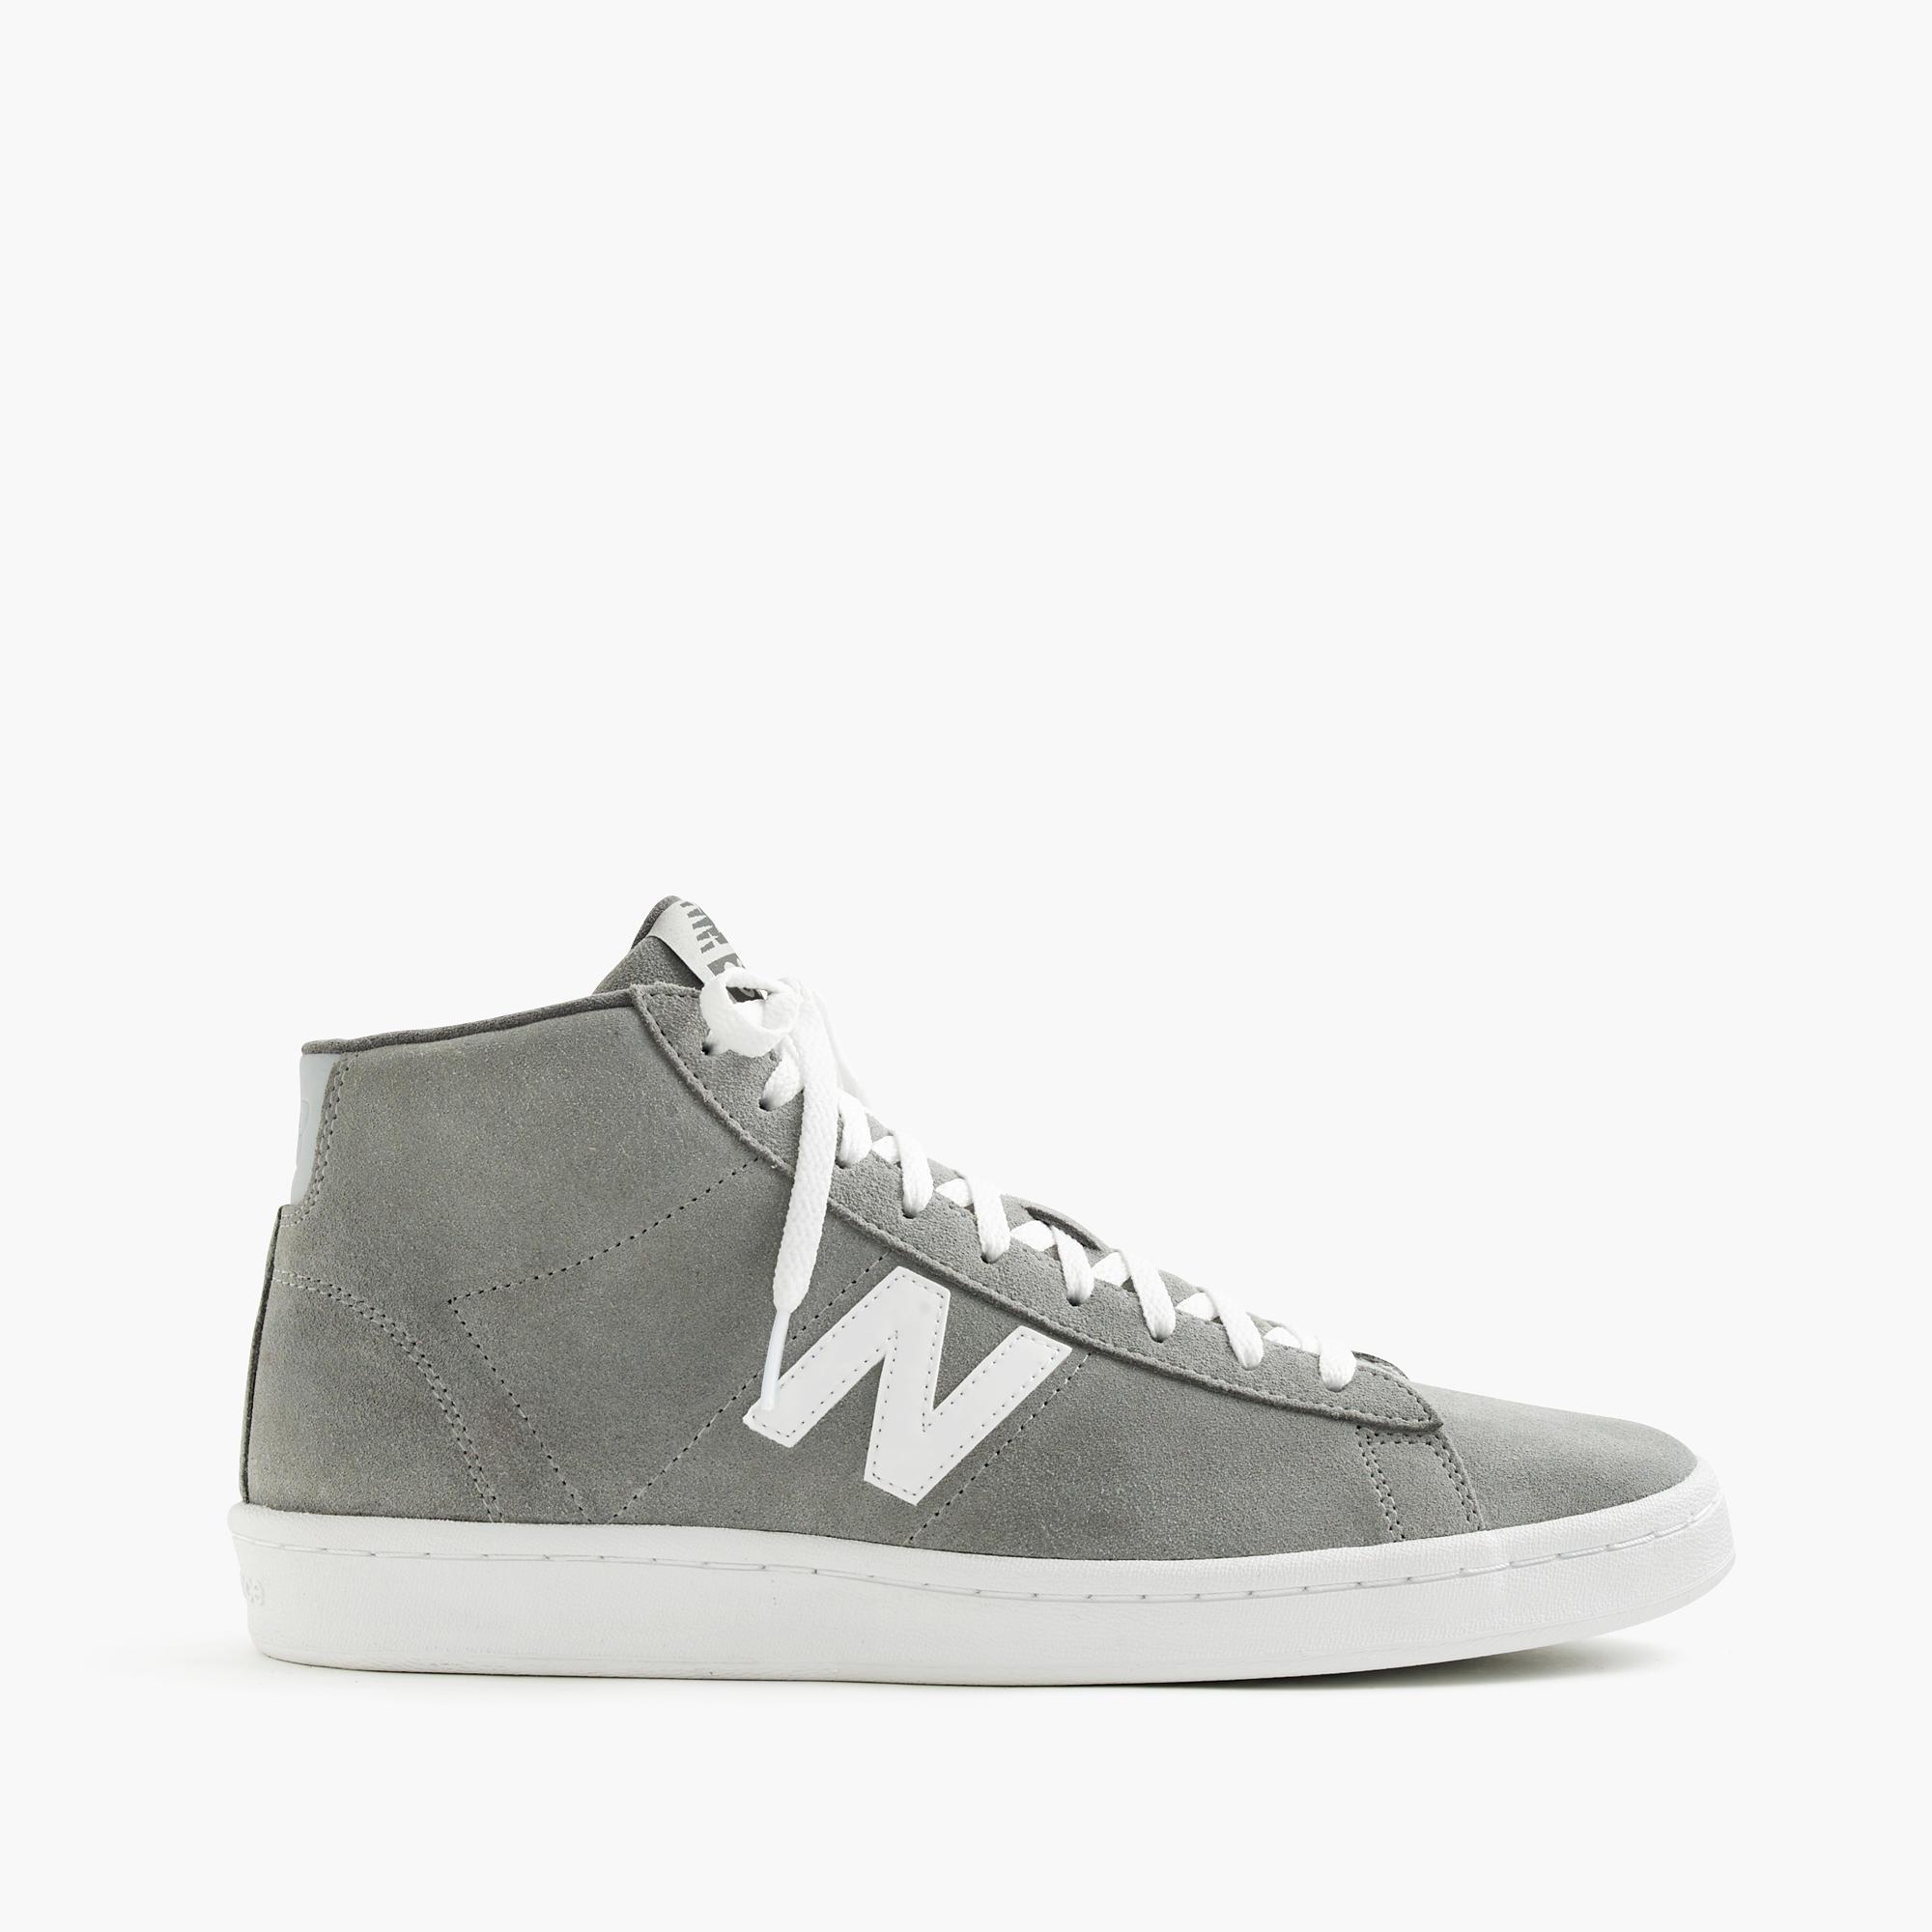 big sale 042a6 34f7a Men's Gray New Balance 891 High-top Sneakers